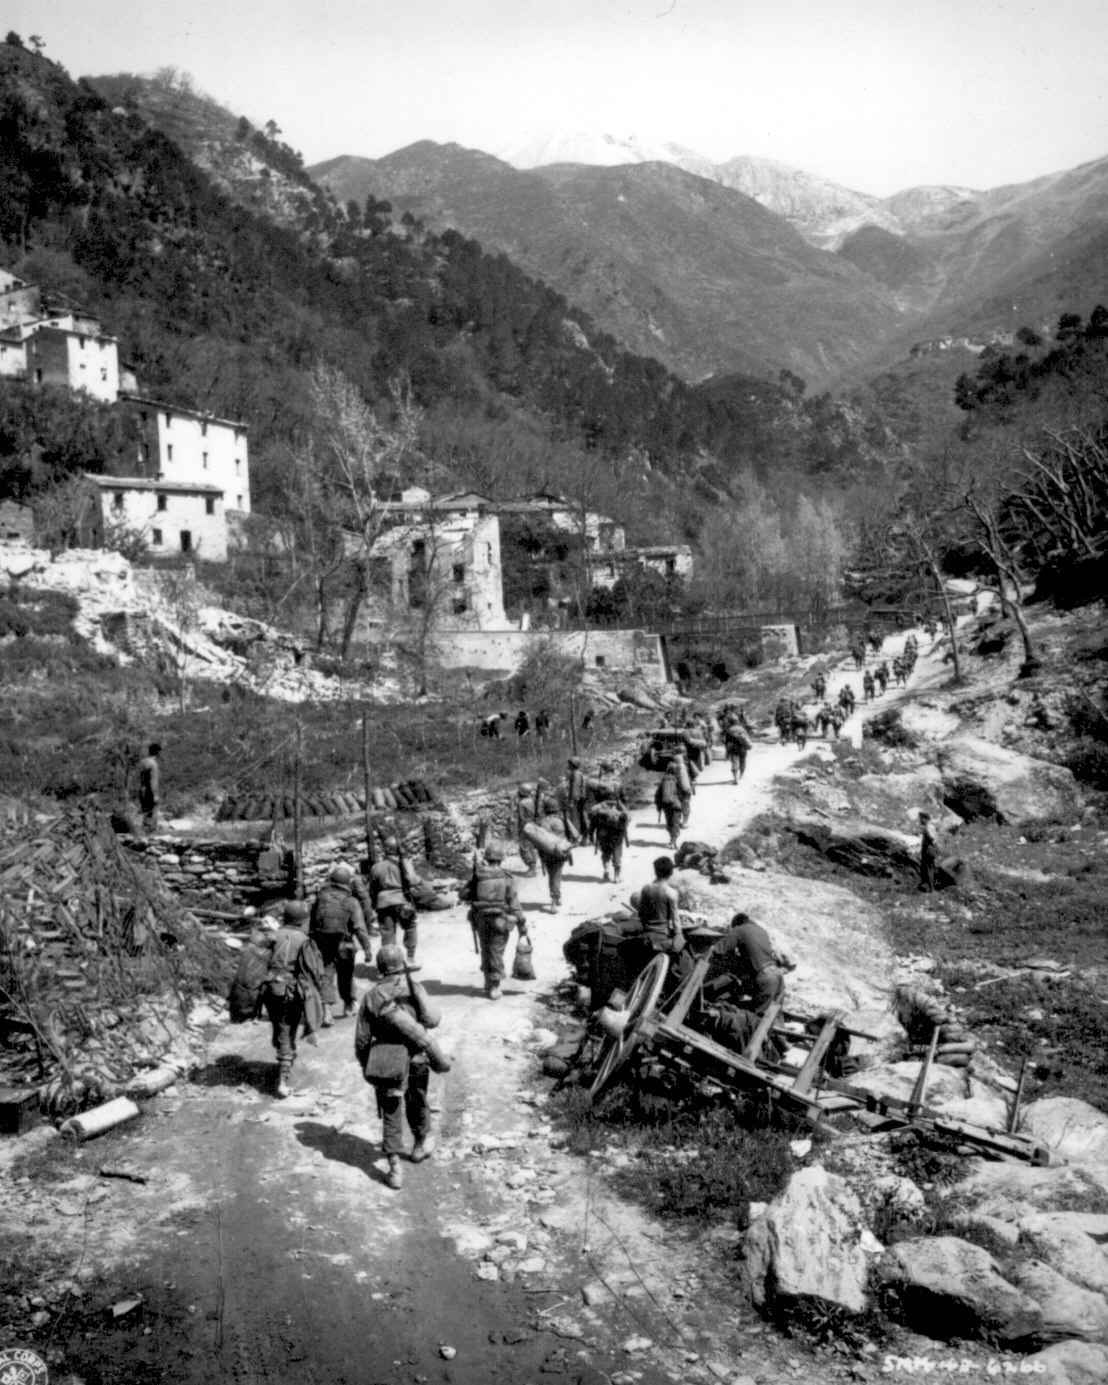 Operation Grapeshot 75th Anniversary Commemoration image